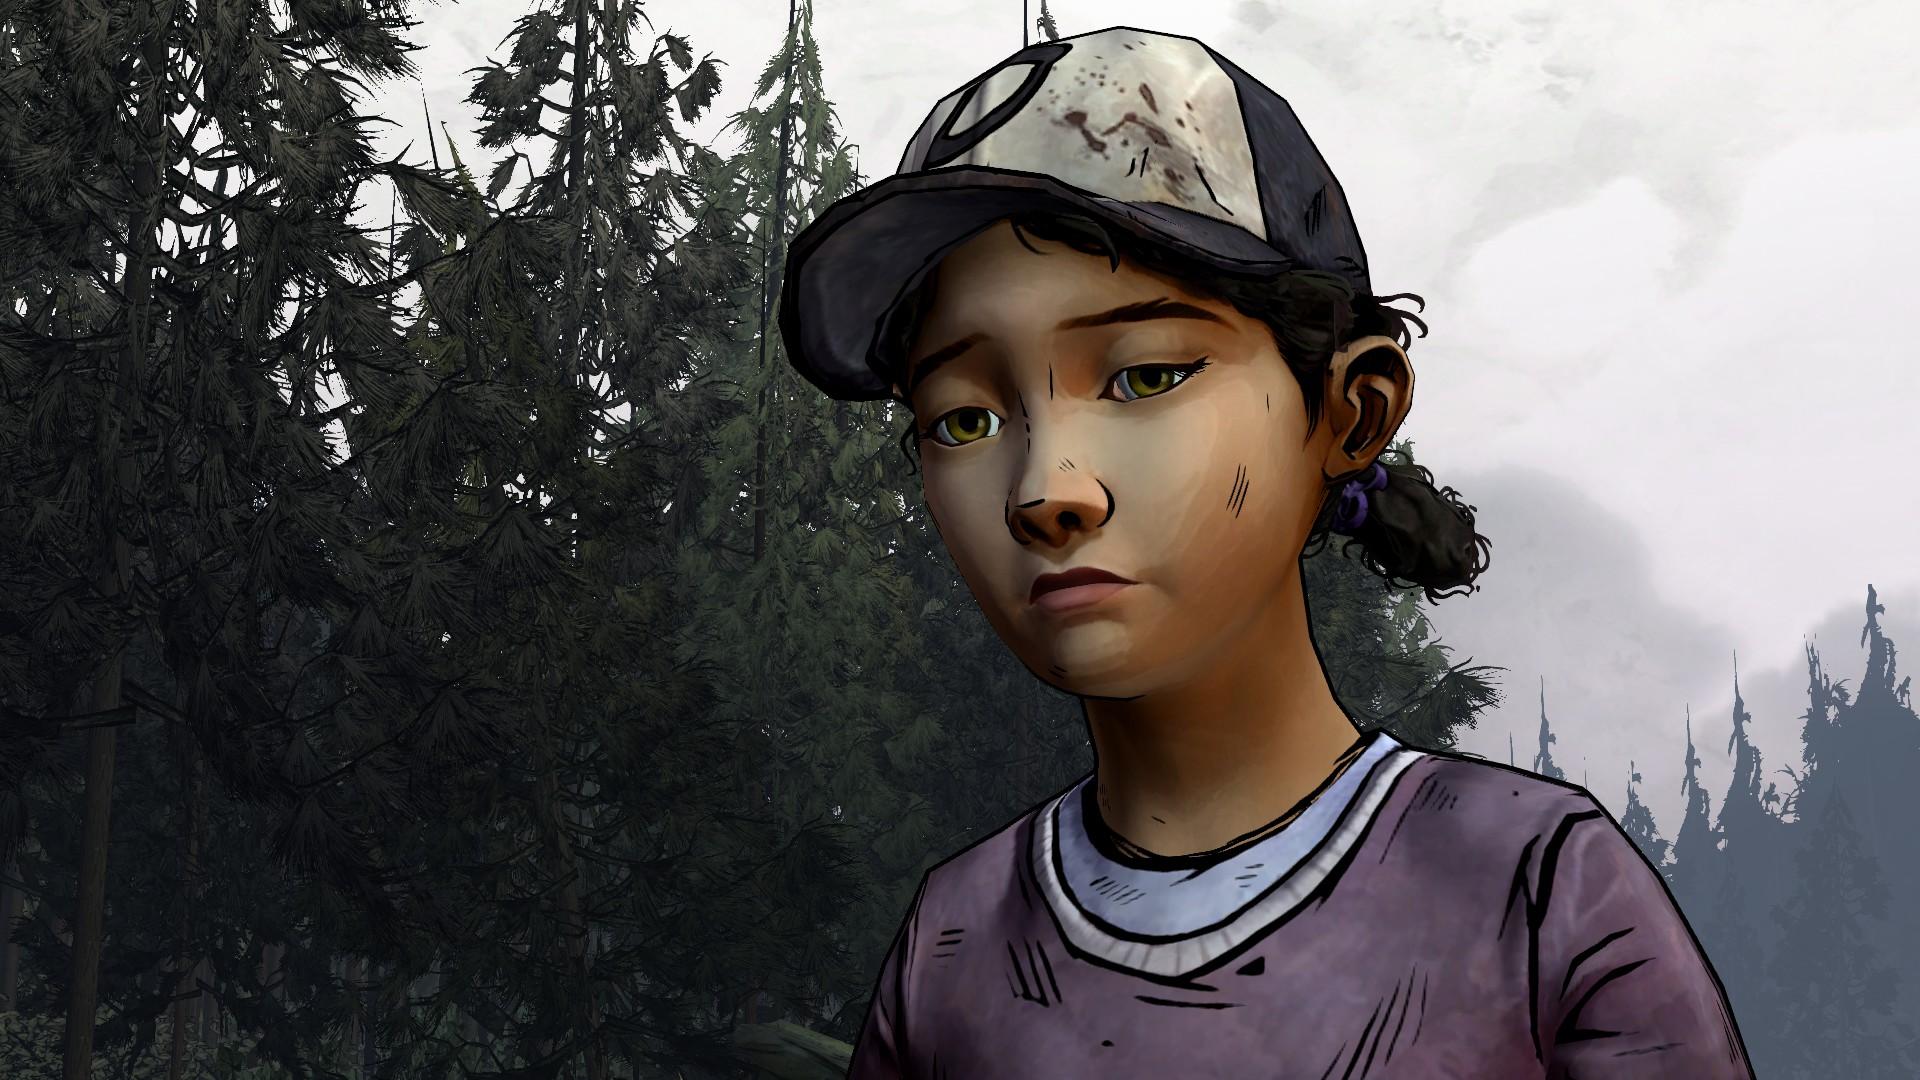 Clementine The Walking Deadseason 2 Minecraft Skin